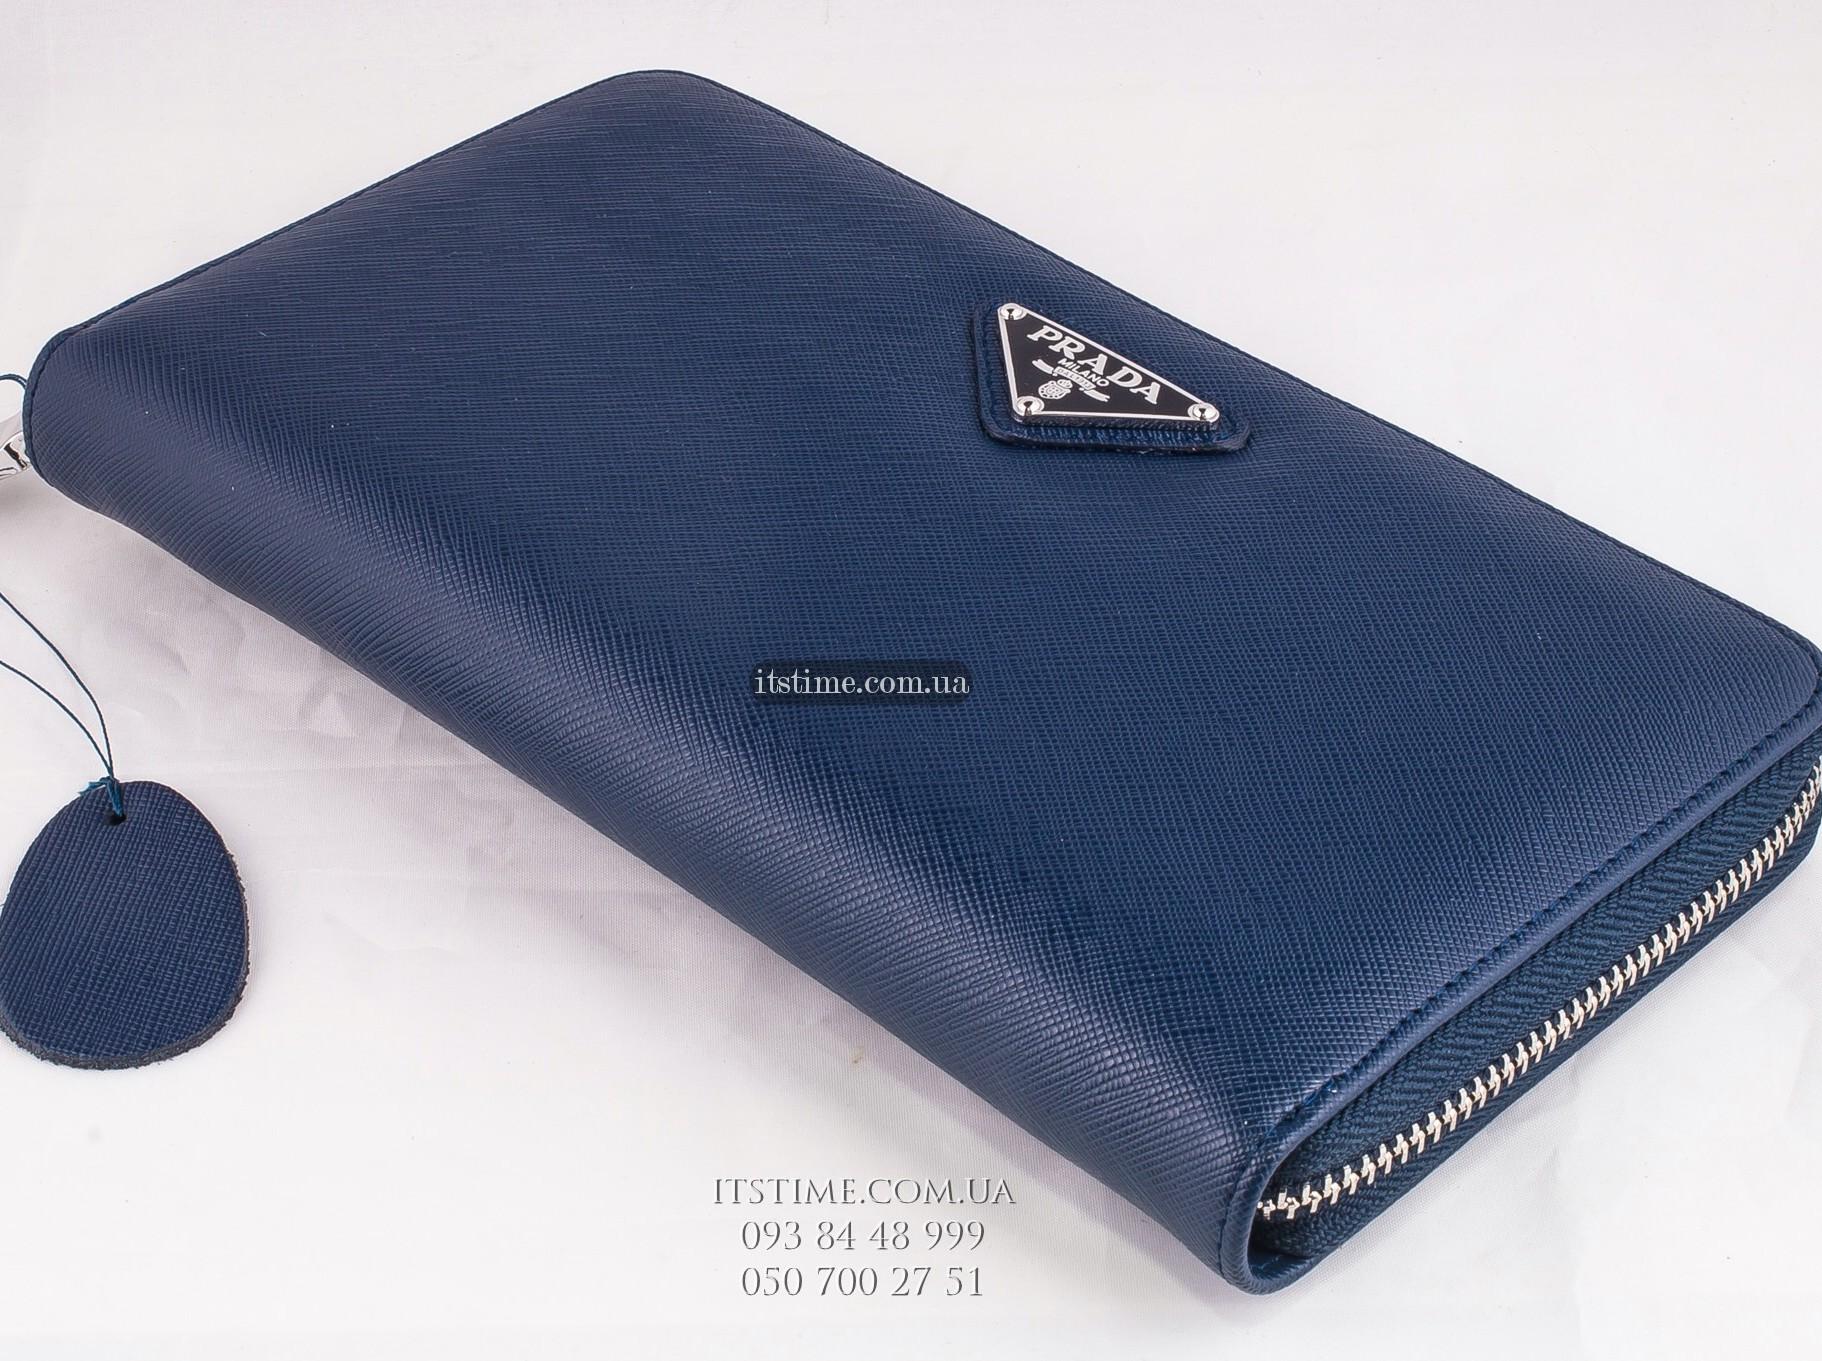 7e6edcda0235 Купить Кошелек Prada Zip Wallet за 1820.00 грн в IT'S TIME